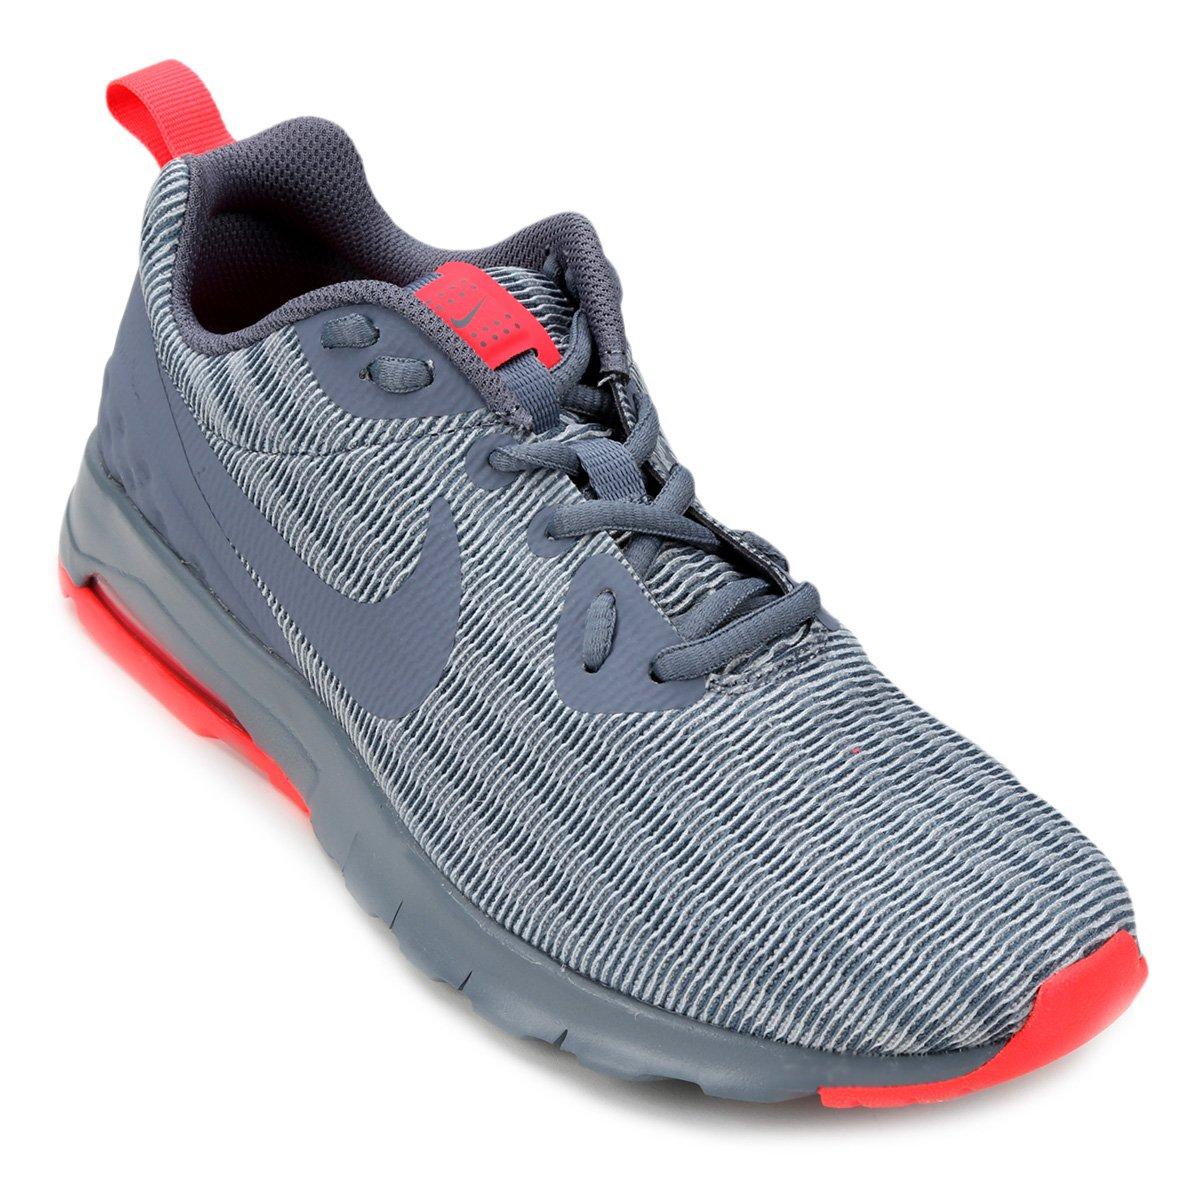 550ed62fb5 Tênis Nike Air Max Motion Lw Se Feminino - Compre Agora